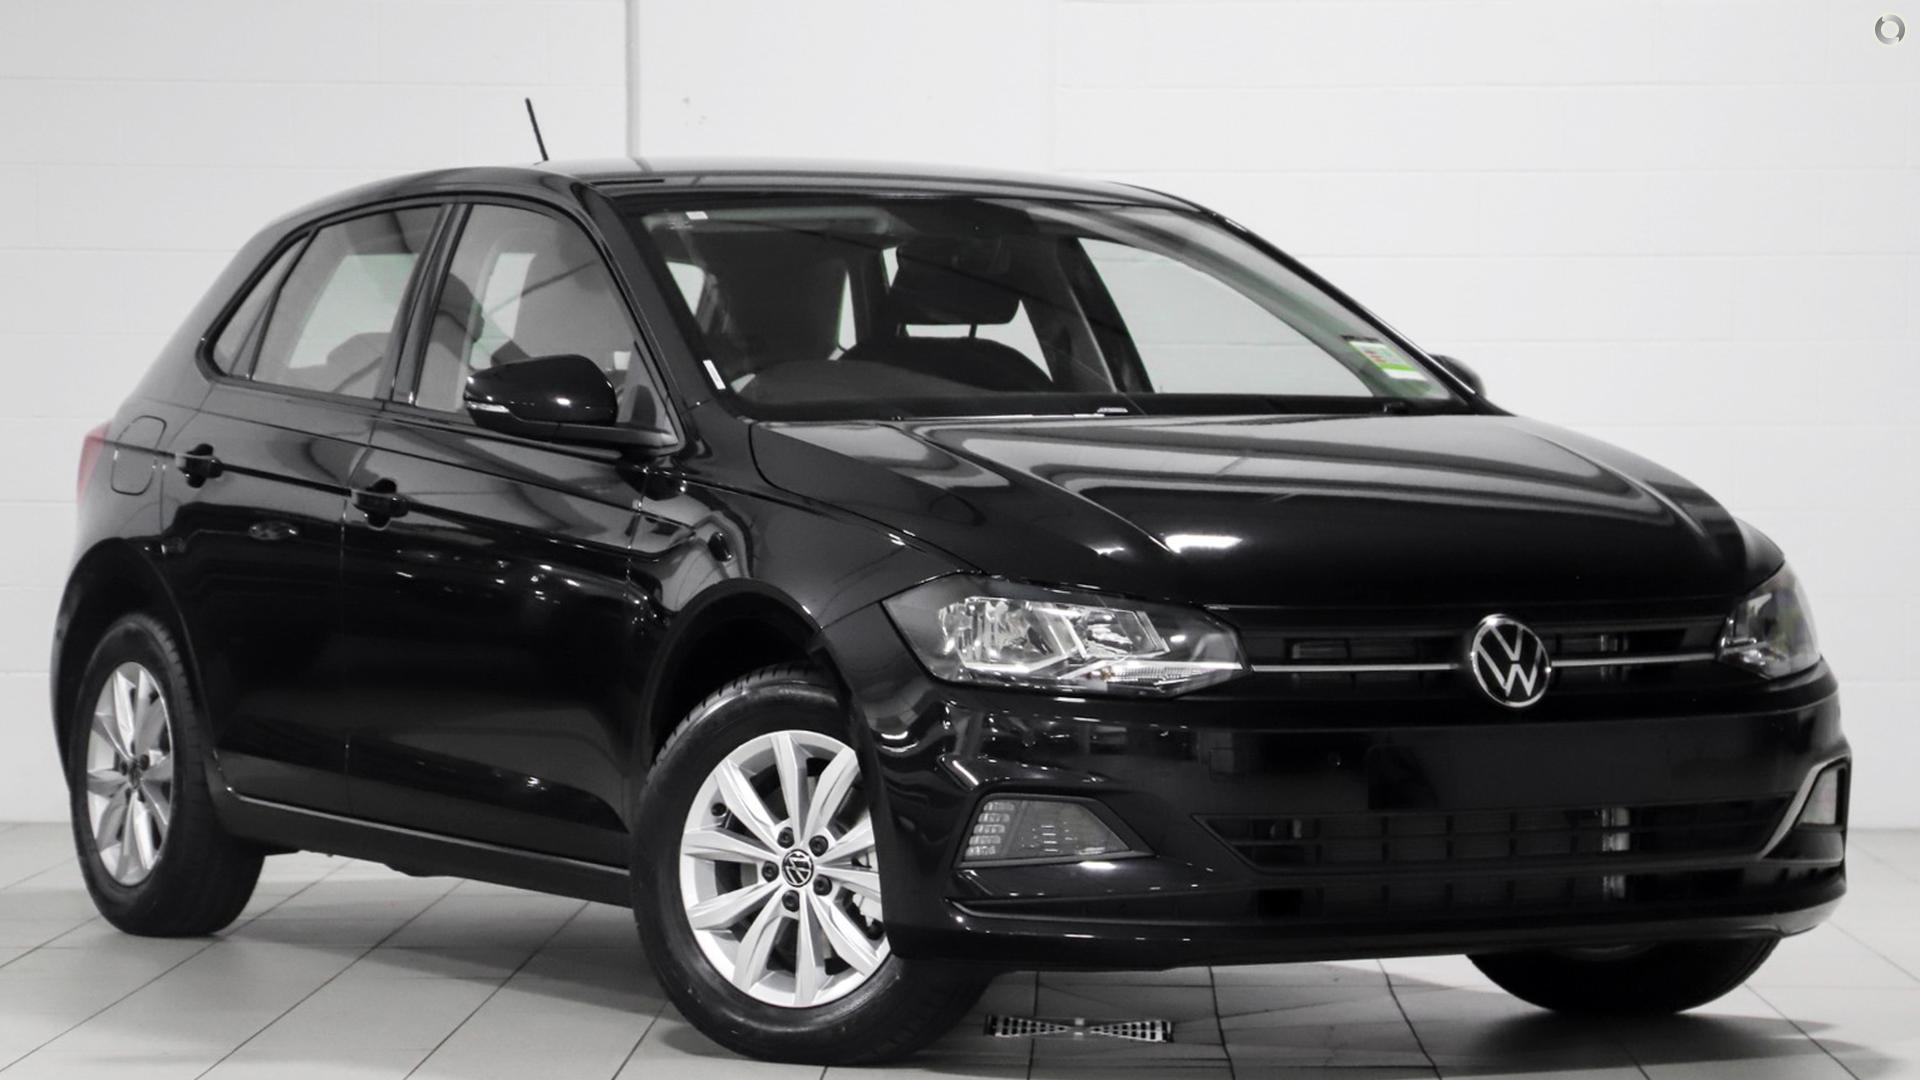 2021 Volkswagen Polo AW